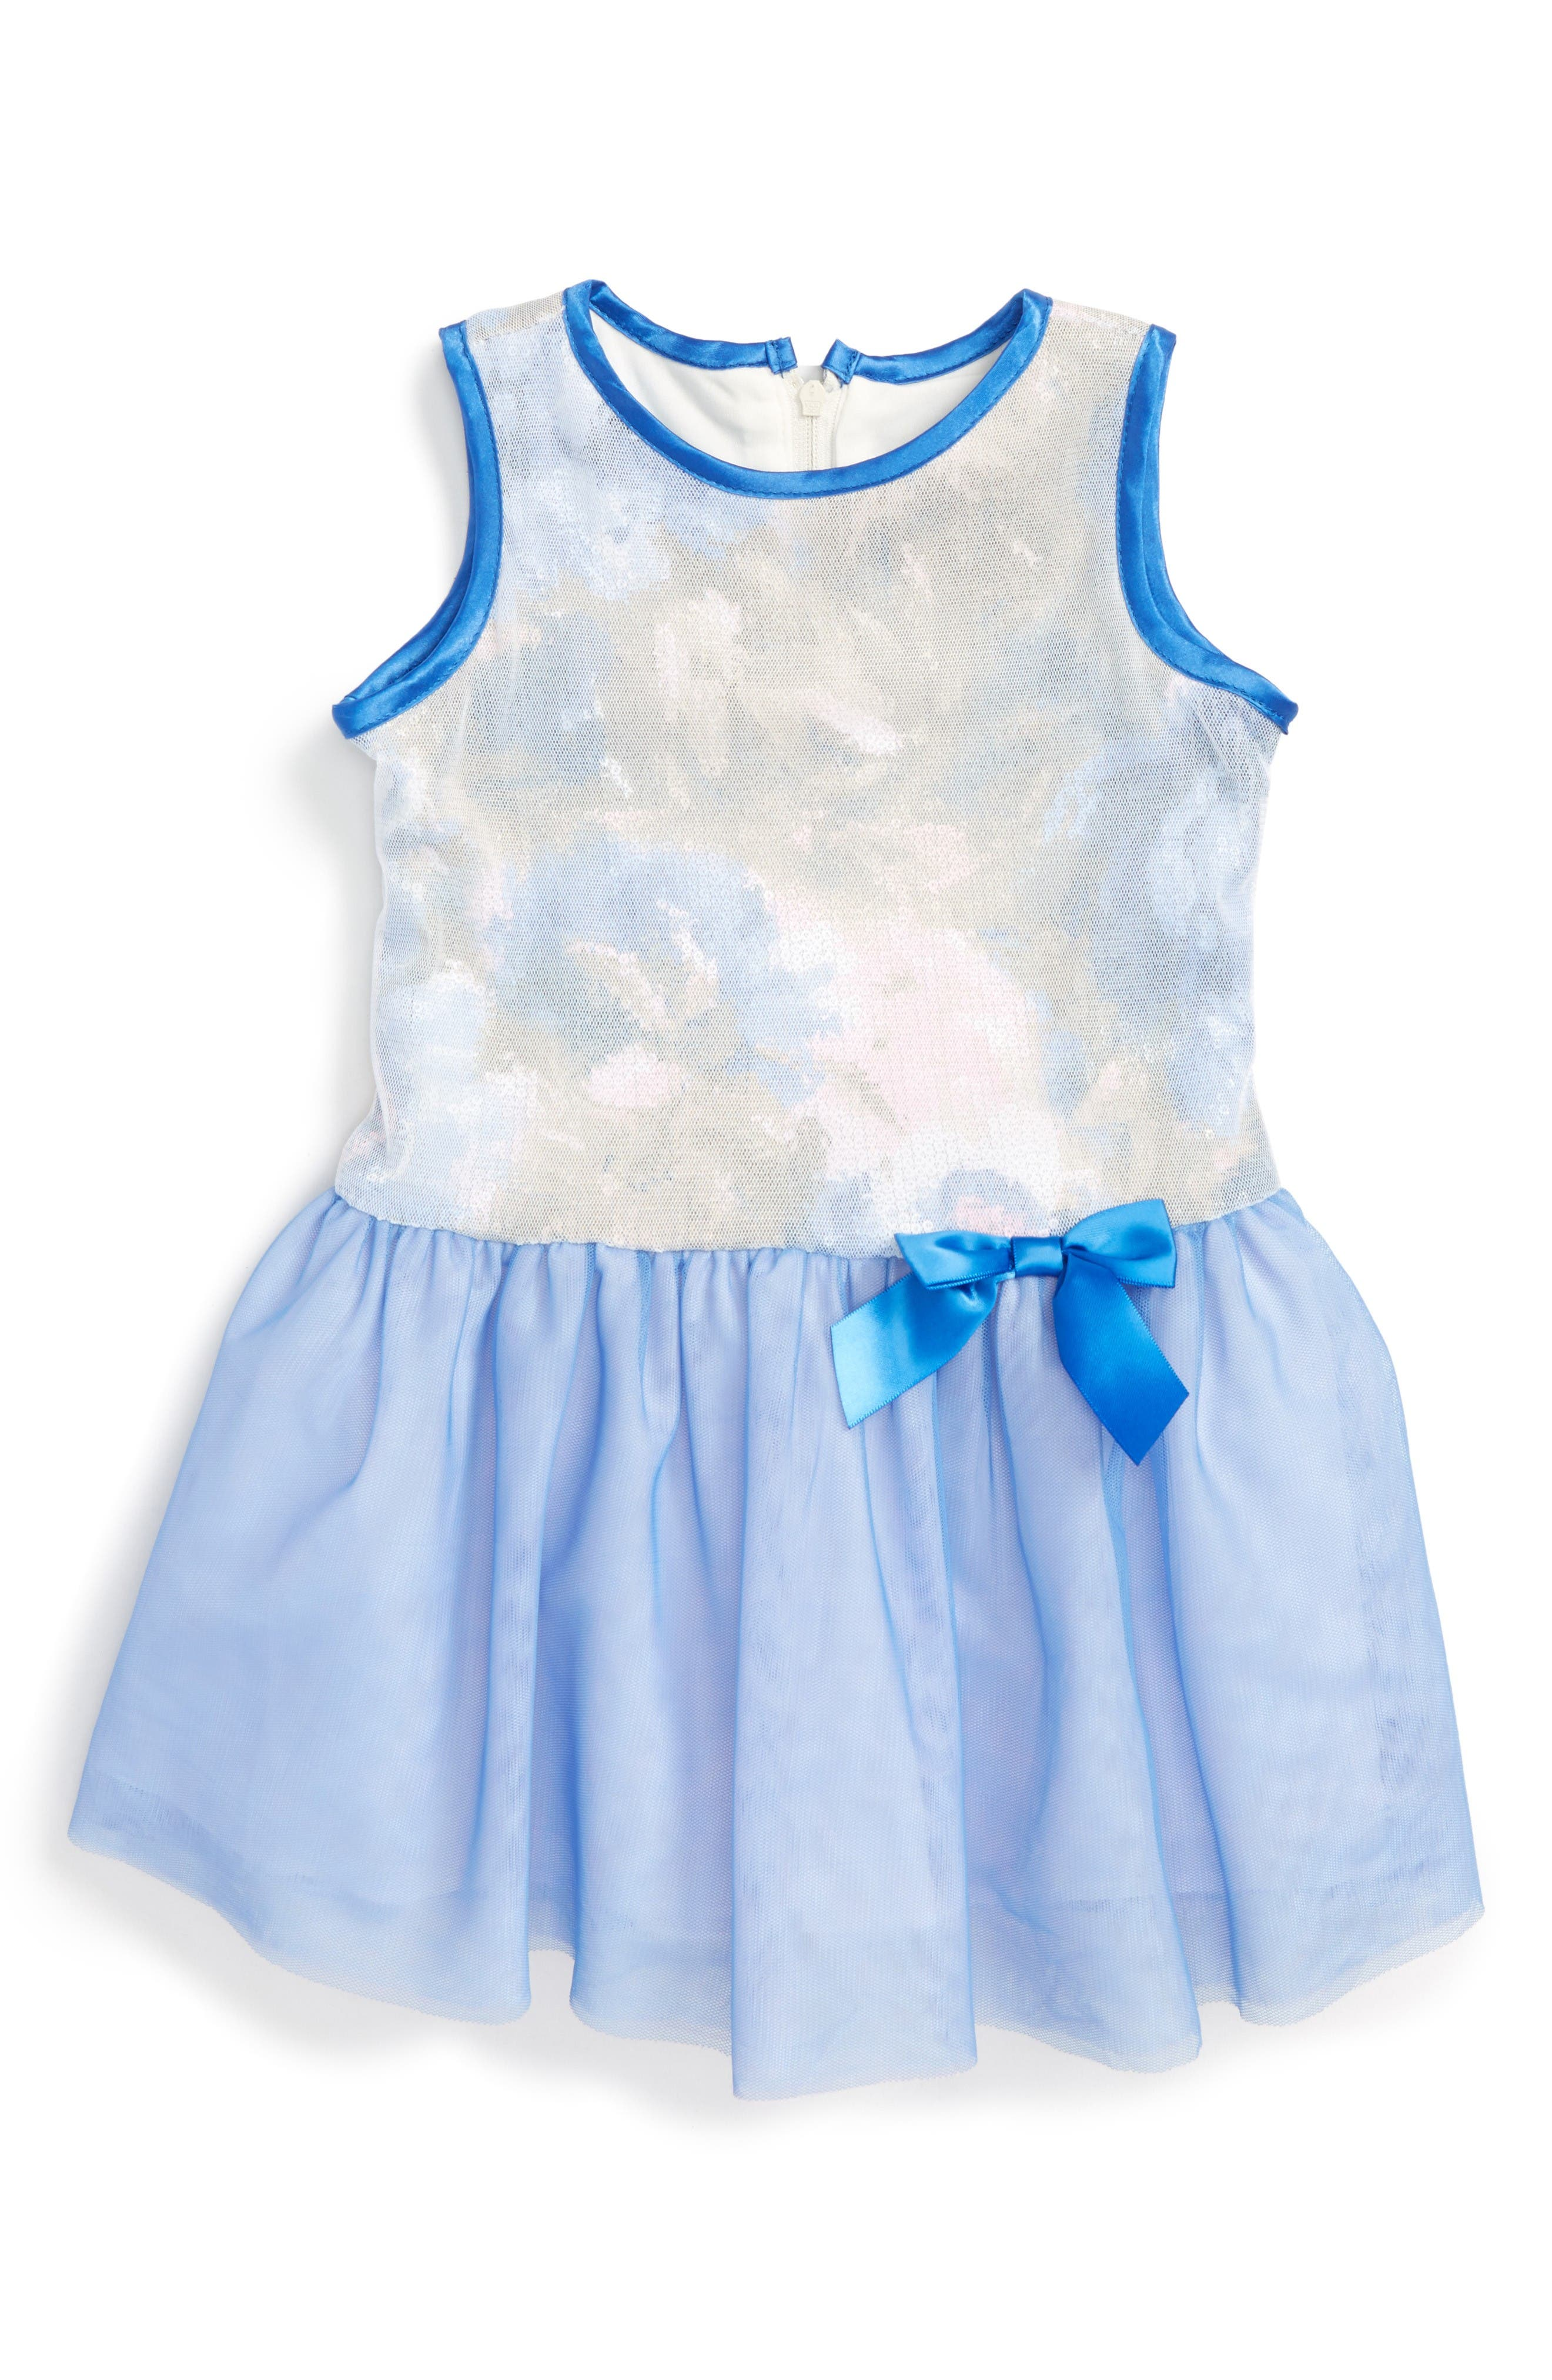 US ANGELS Drop Waist Dress